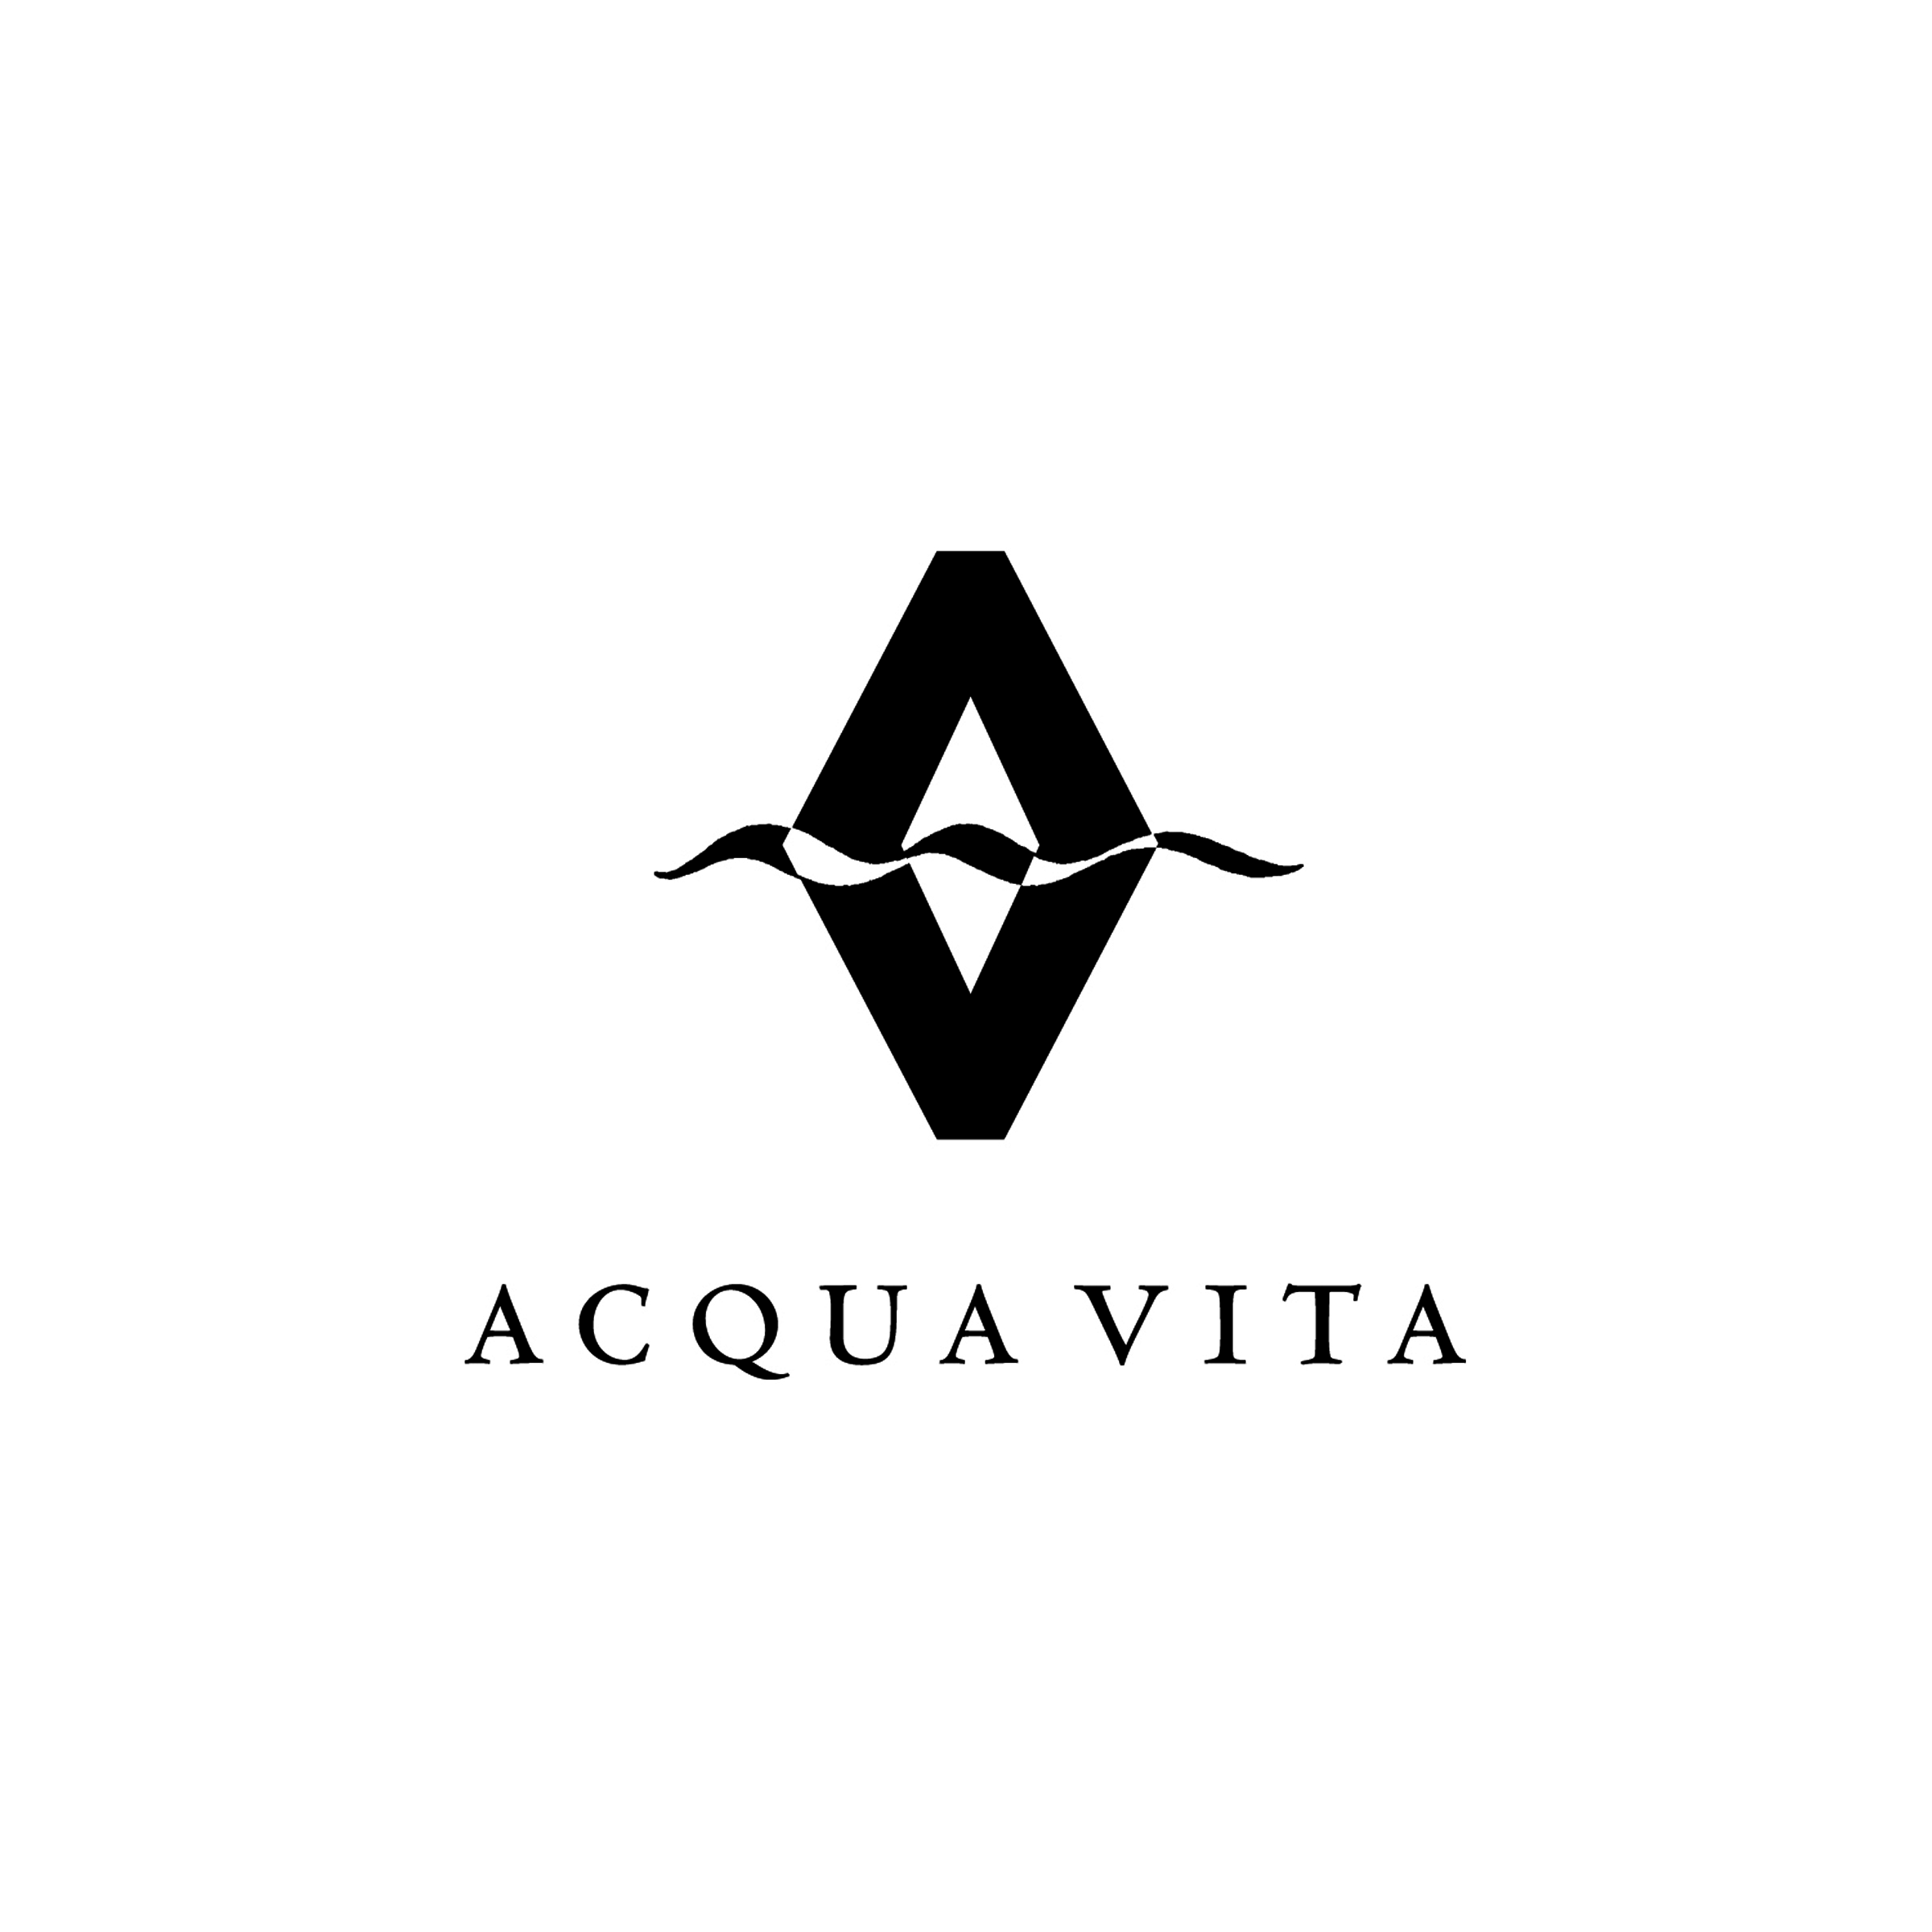 AquaVitaLogo_BLACK.ƒ.jpg